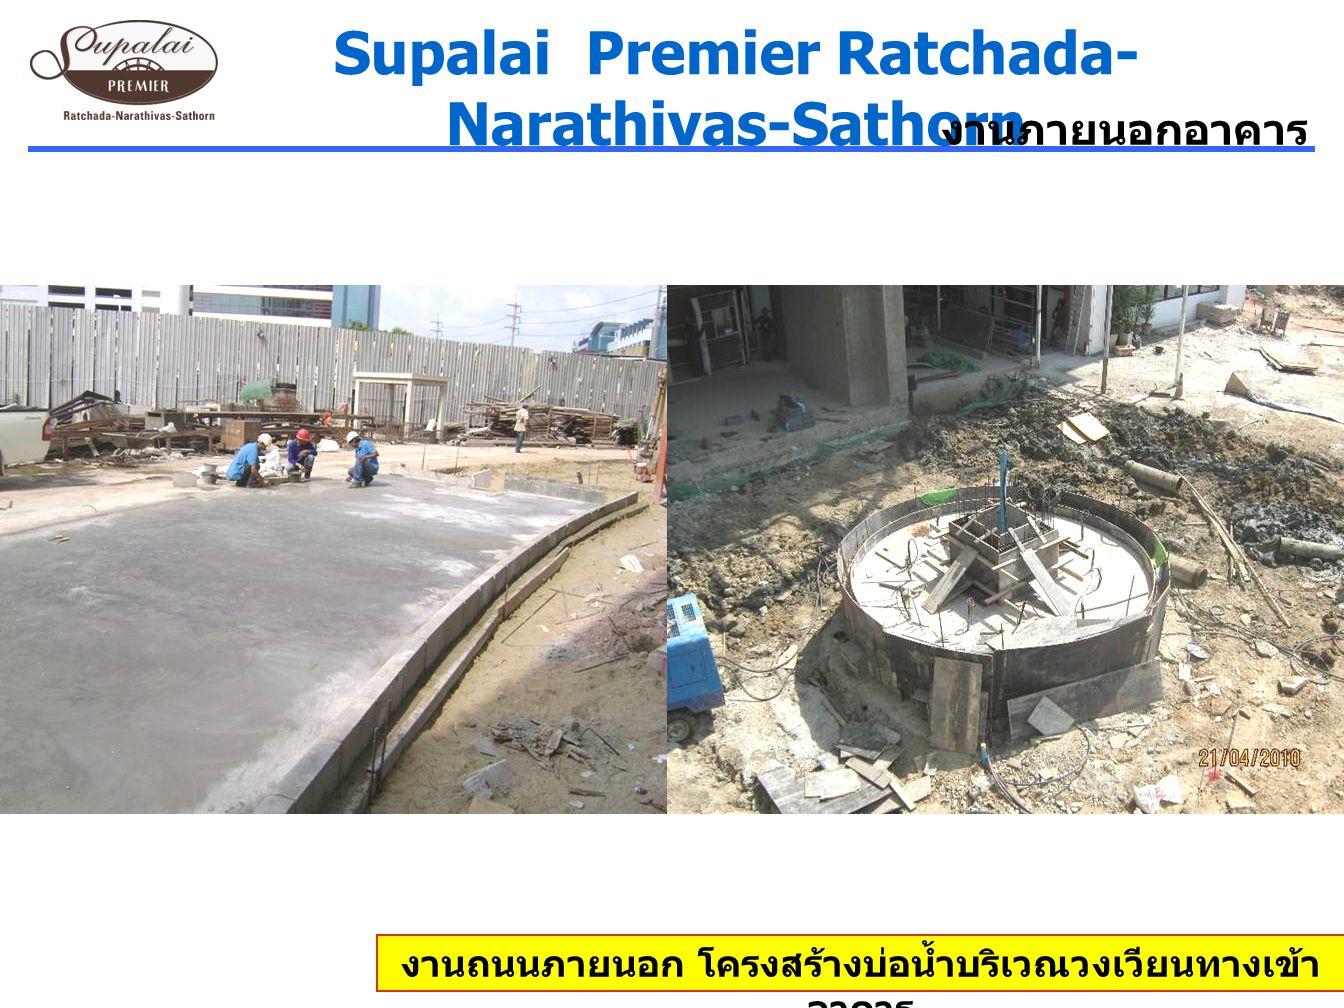 Supalai Premier Ratchada- Narathivas-Sathorn งานภายนอกอาคาร งานถนนภายนอก โครงสร้างบ่อน้ำบริเวณวงเวียนทางเข้า อาคาร